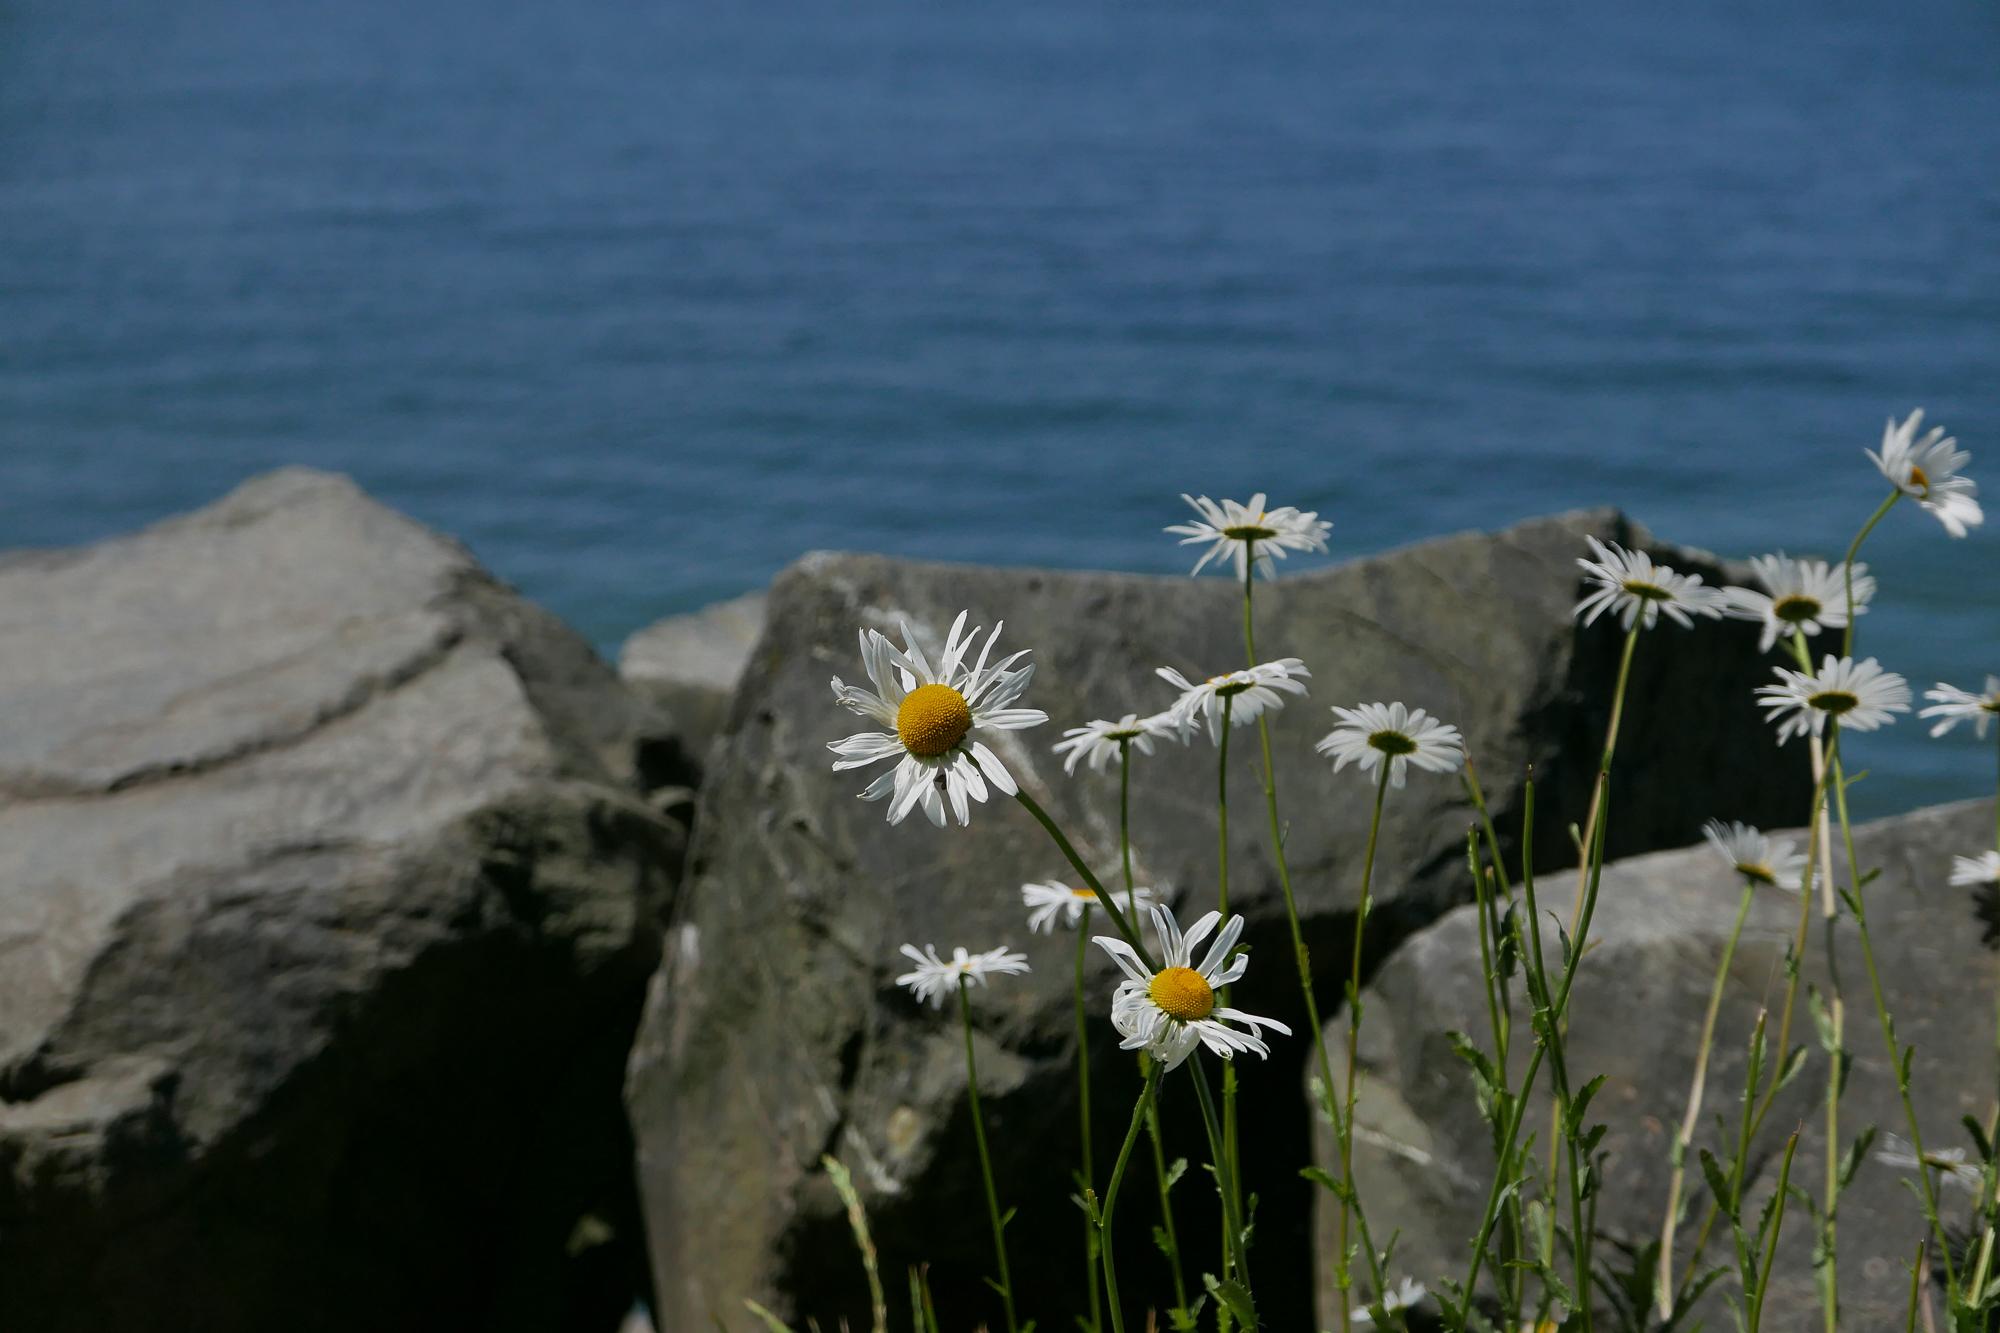 Puget Sound sea daisies